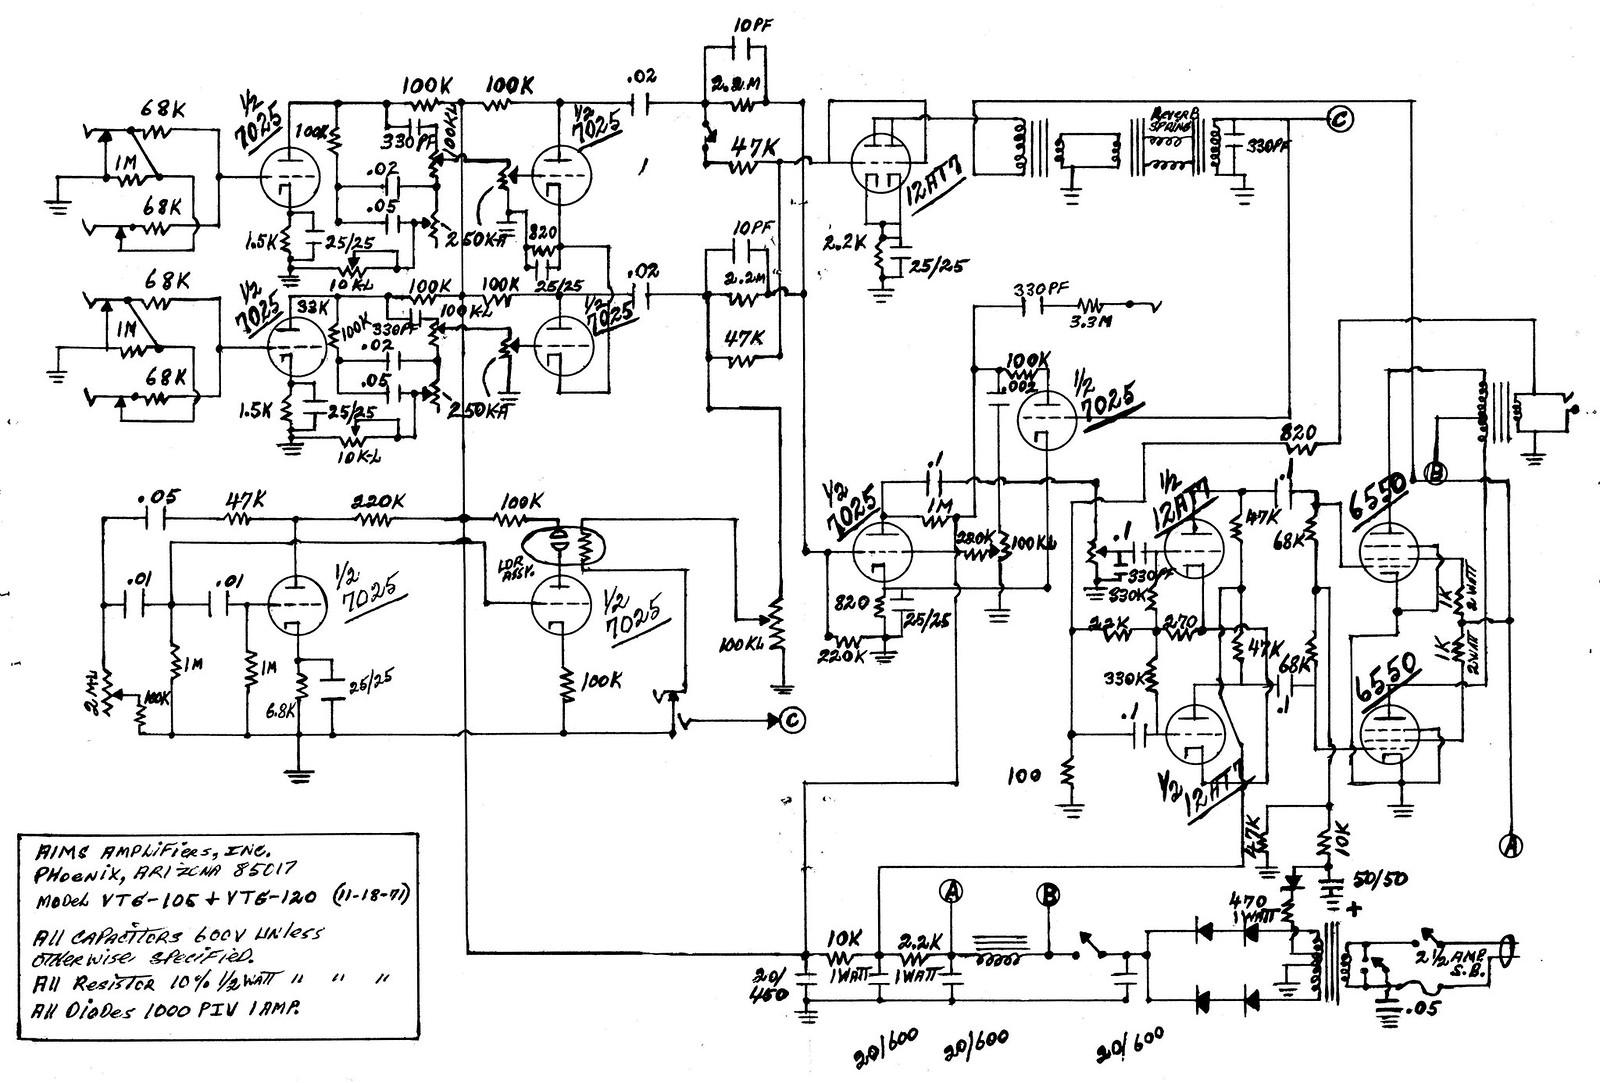 Doerr Compressor Motor Lr22132 Wiring Diagram - 2008 Dodge Ram 1500 Fuse  Diagram - basic-wiring.yenpancane.jeanjaures37.frWiring Diagram Resource